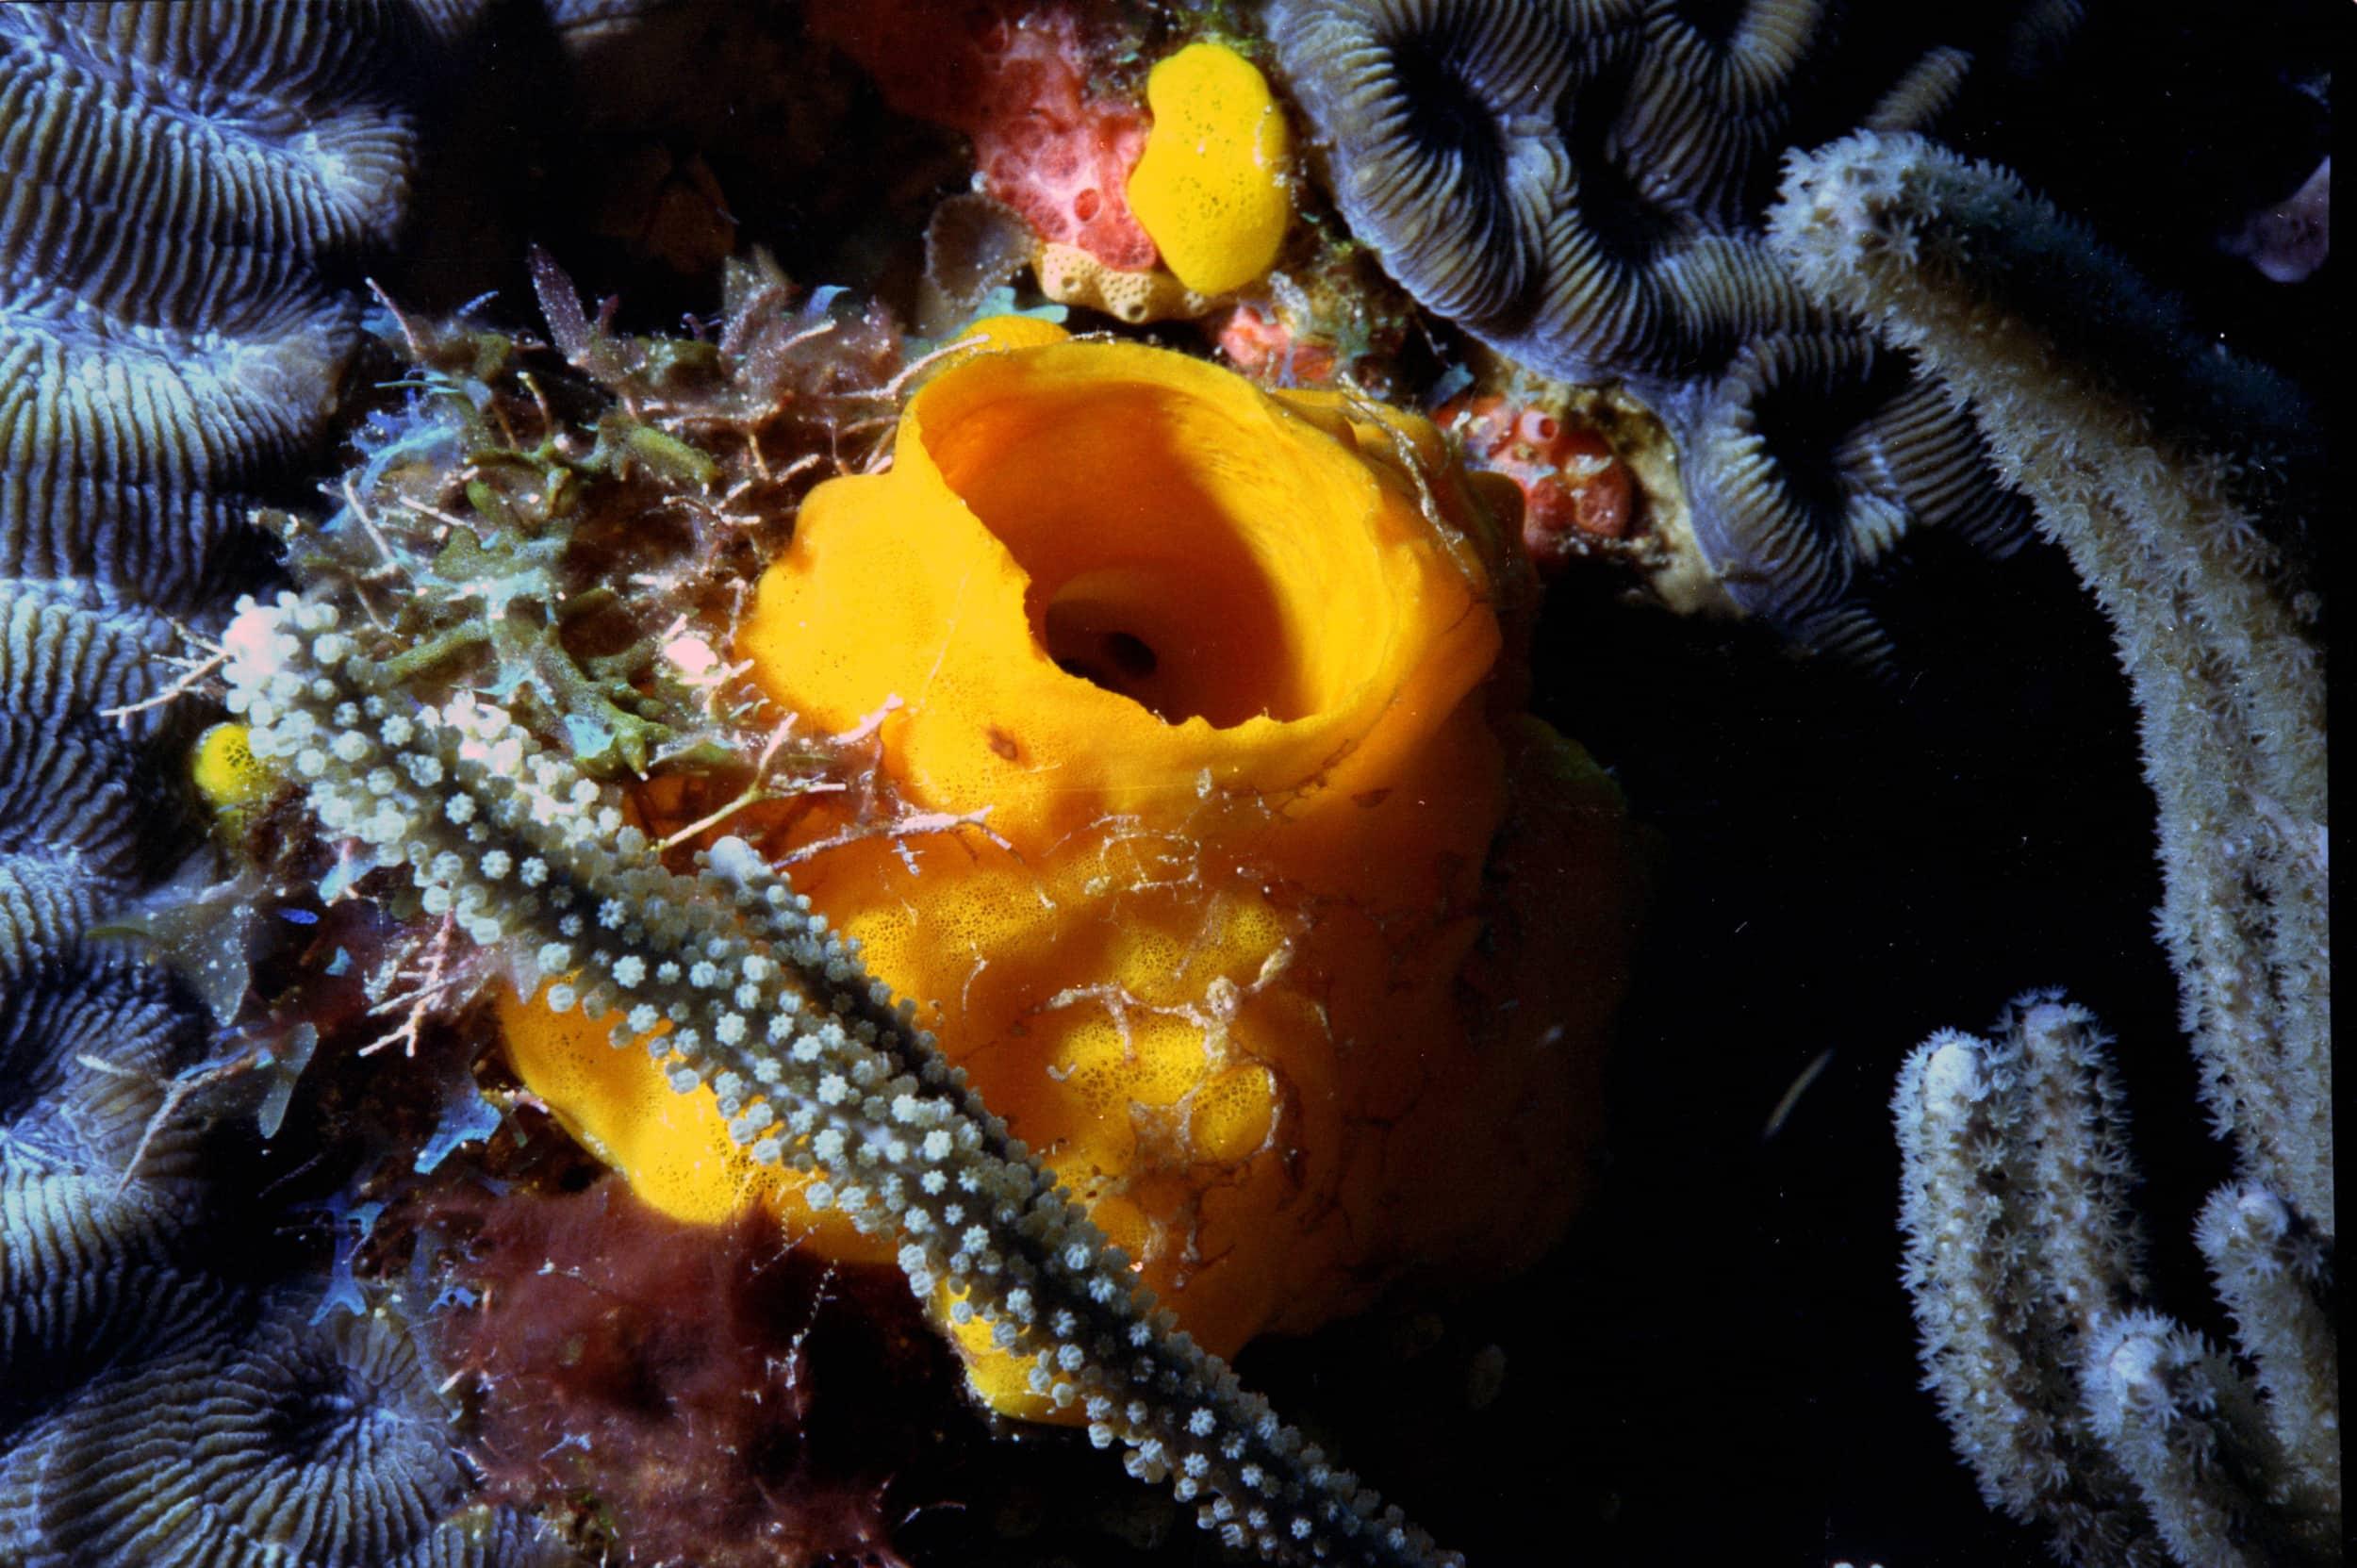 Yellow Tube Sponge on Corals